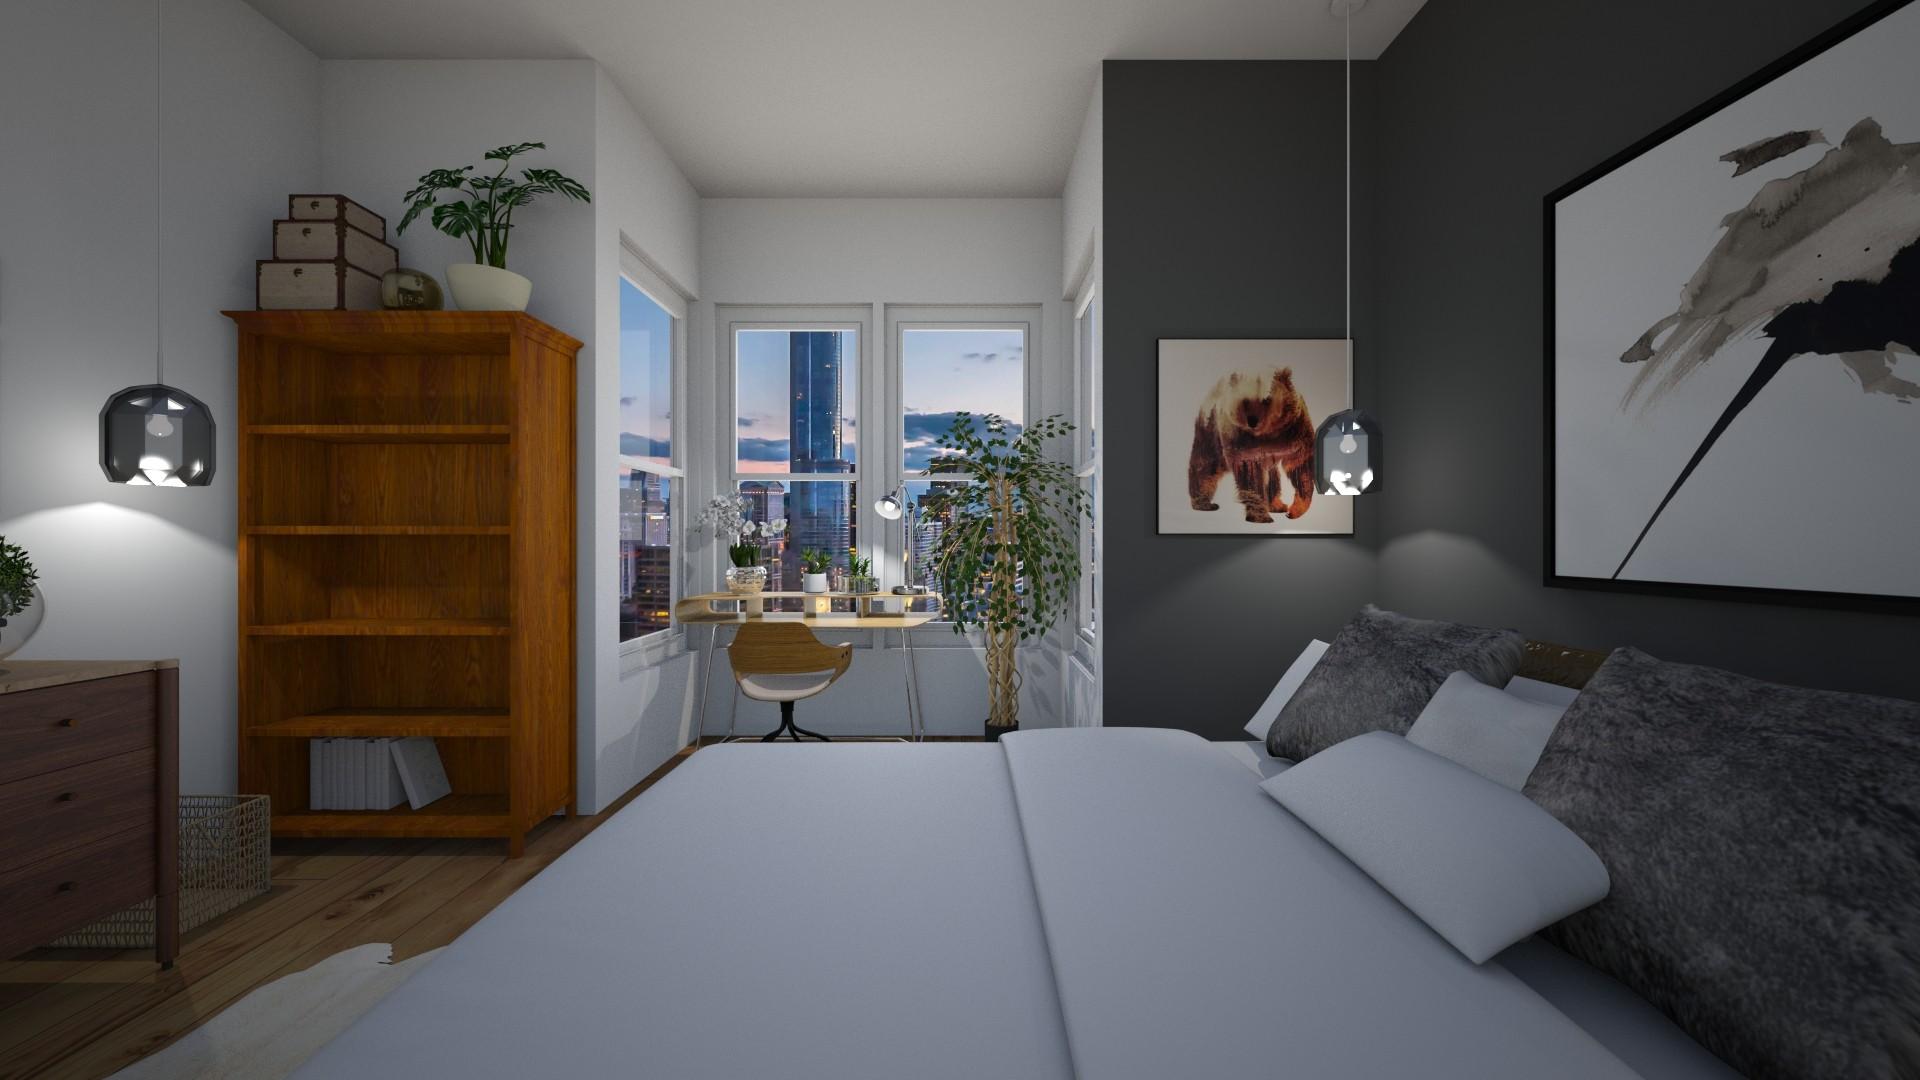 ssss - Bedroom - by ljubitelj